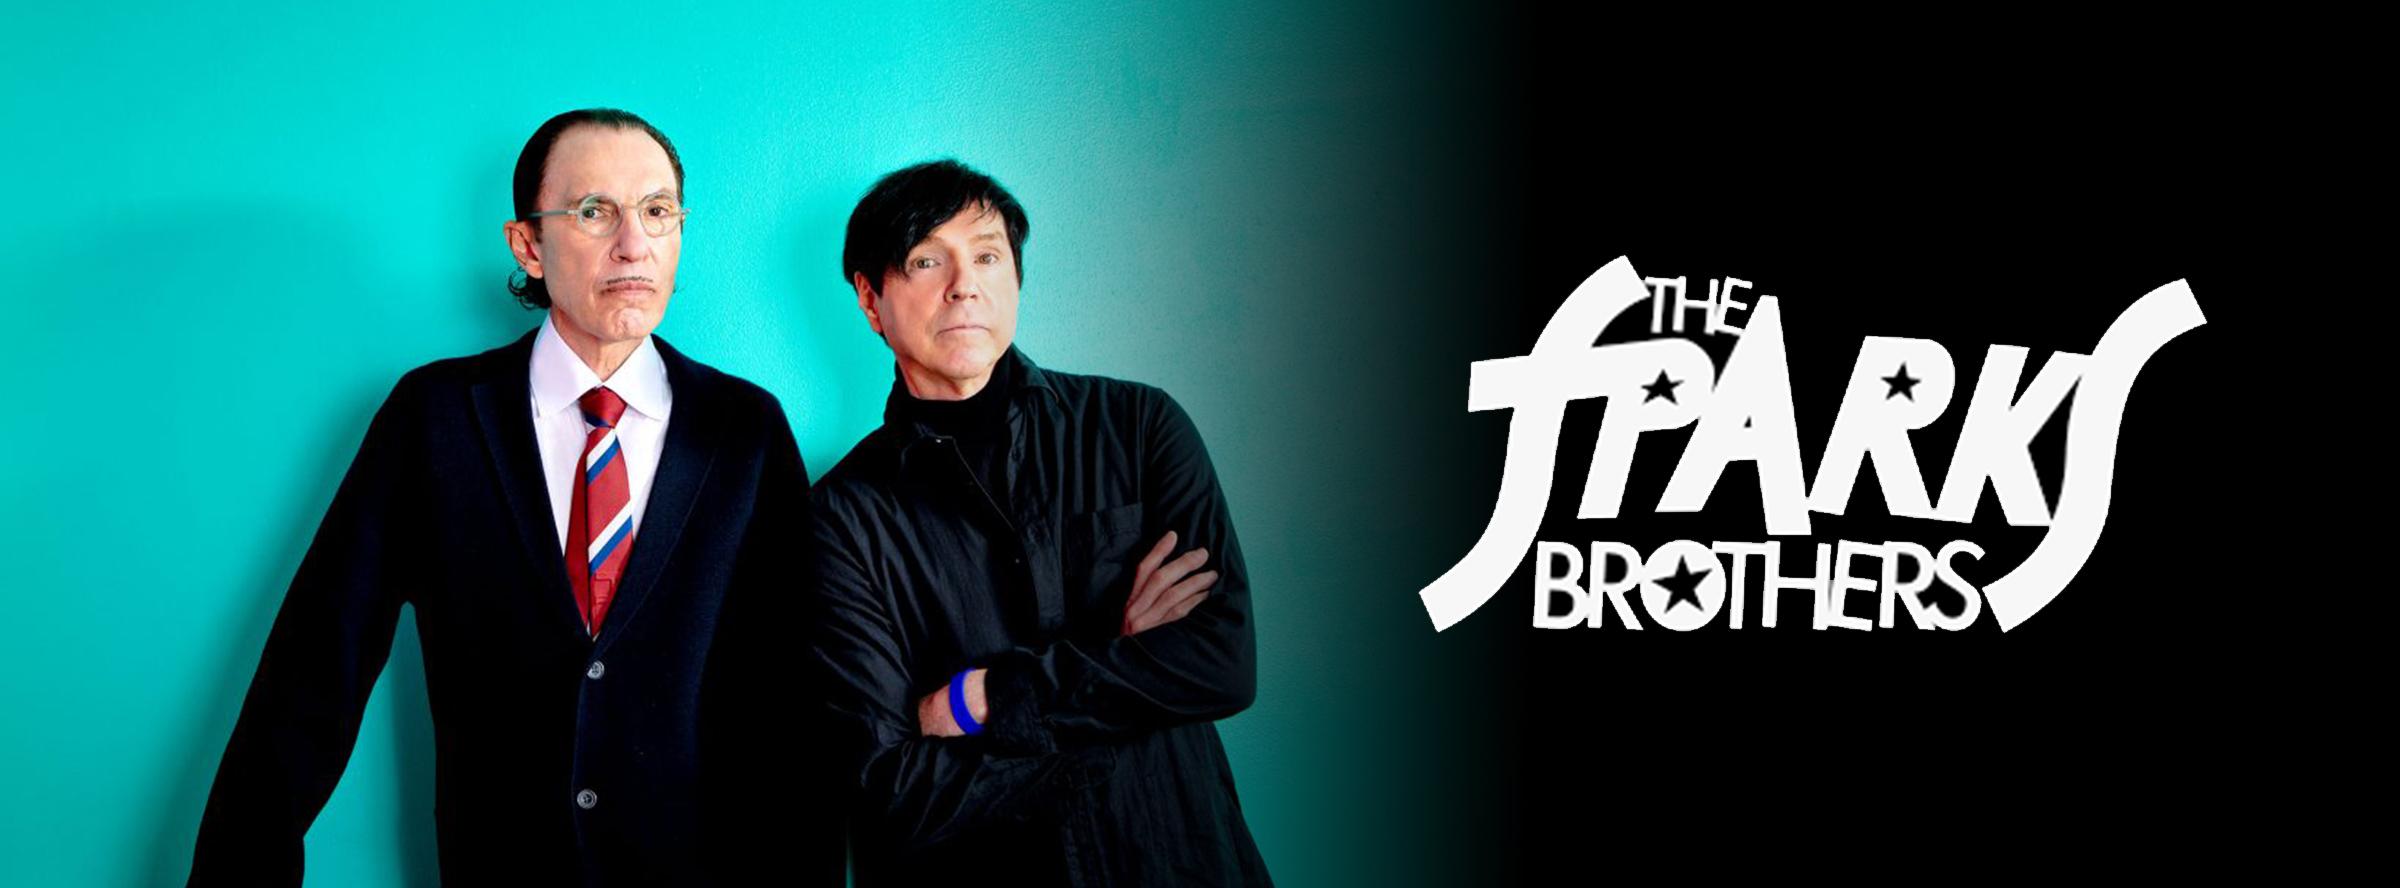 Slider Image for The Sparks Brothers